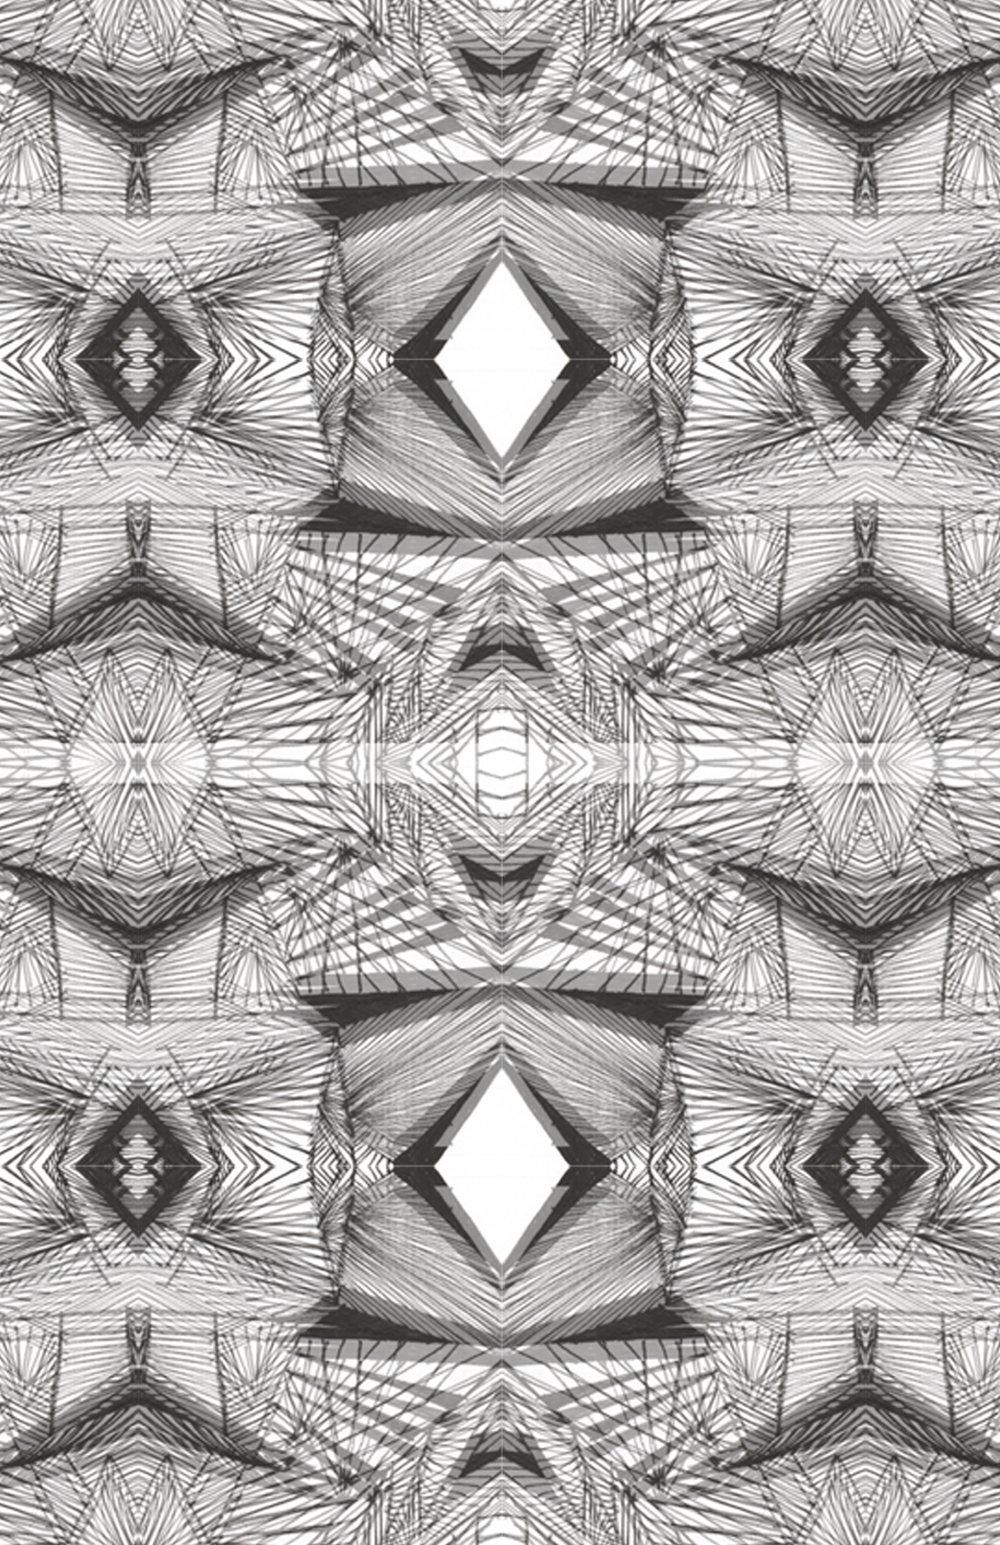 pattern3-1.jpg